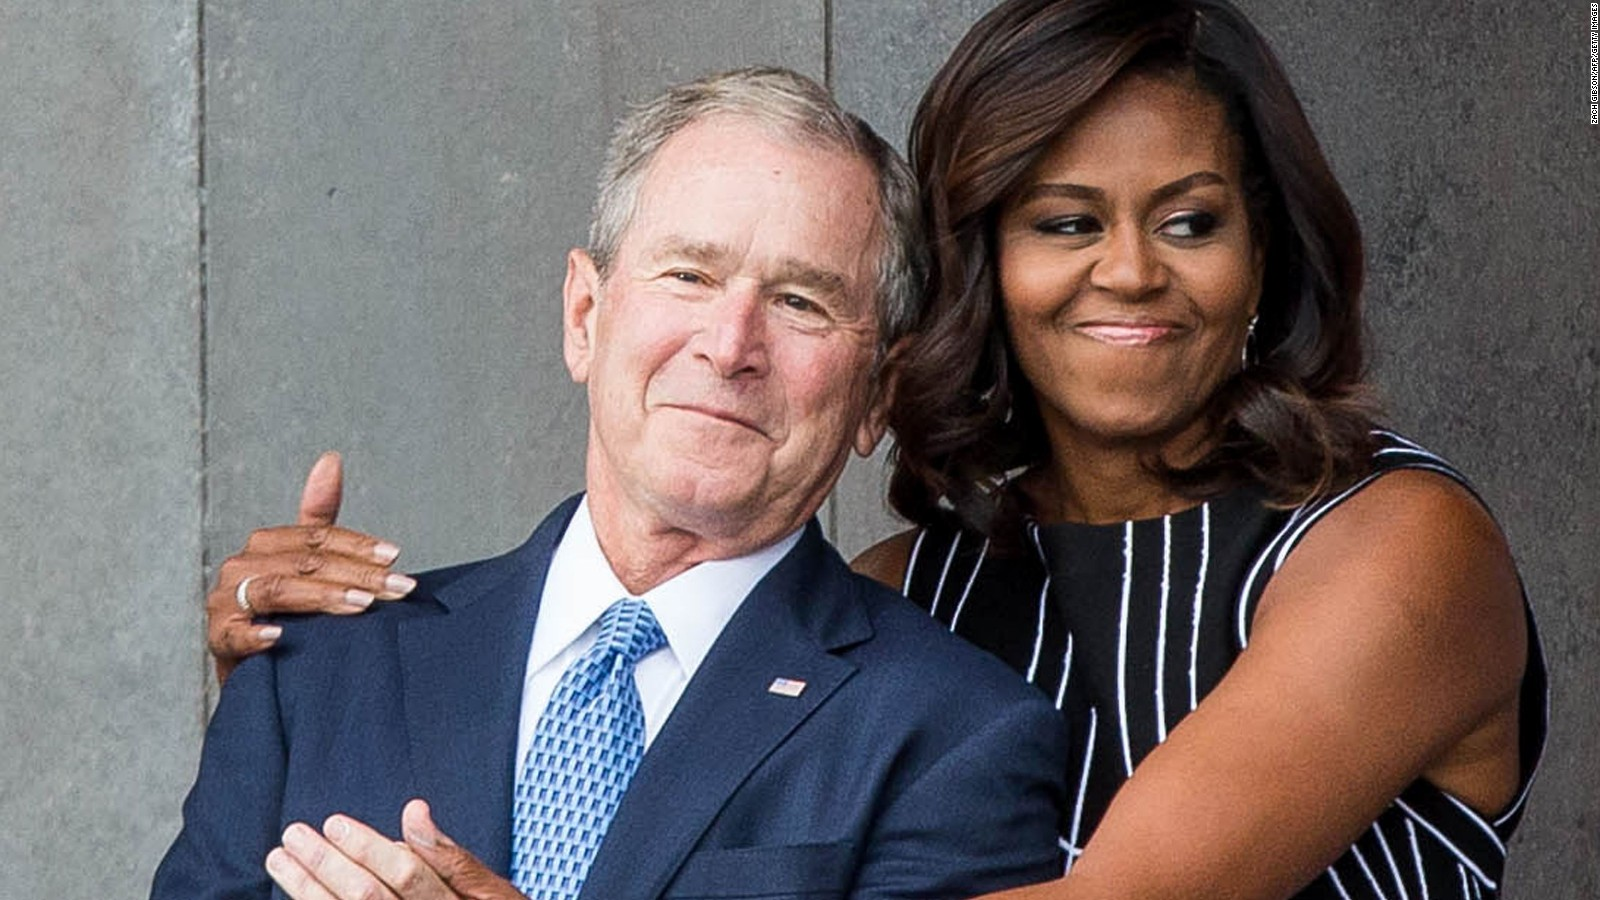 George W Bush Explains His Fondness For Michelle Obama Cnnpolitics